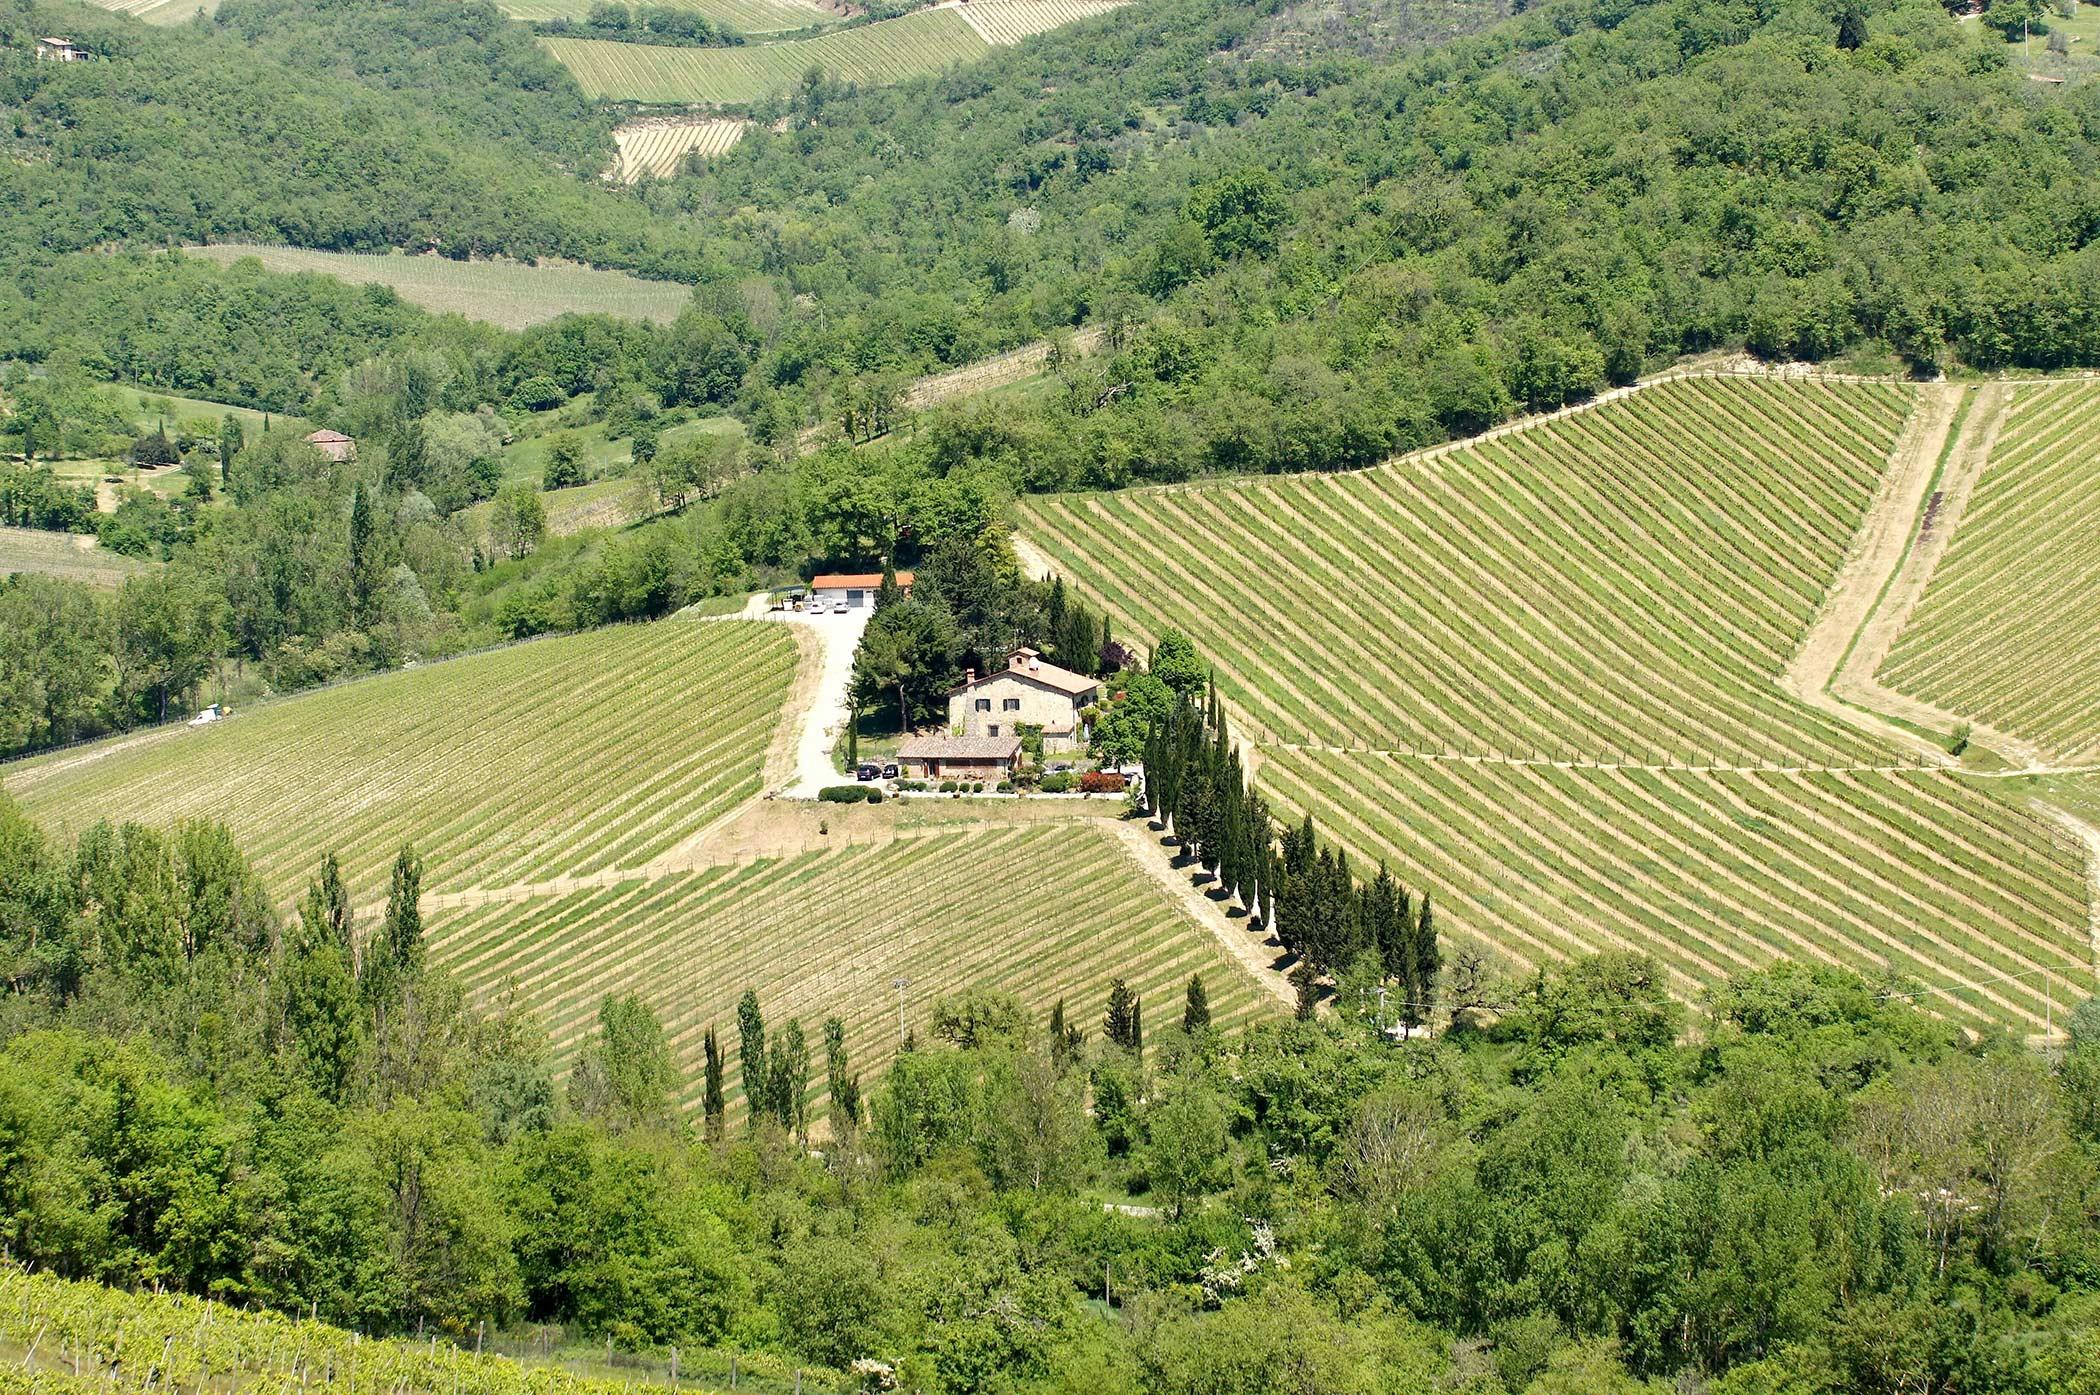 Le Miccine Winery